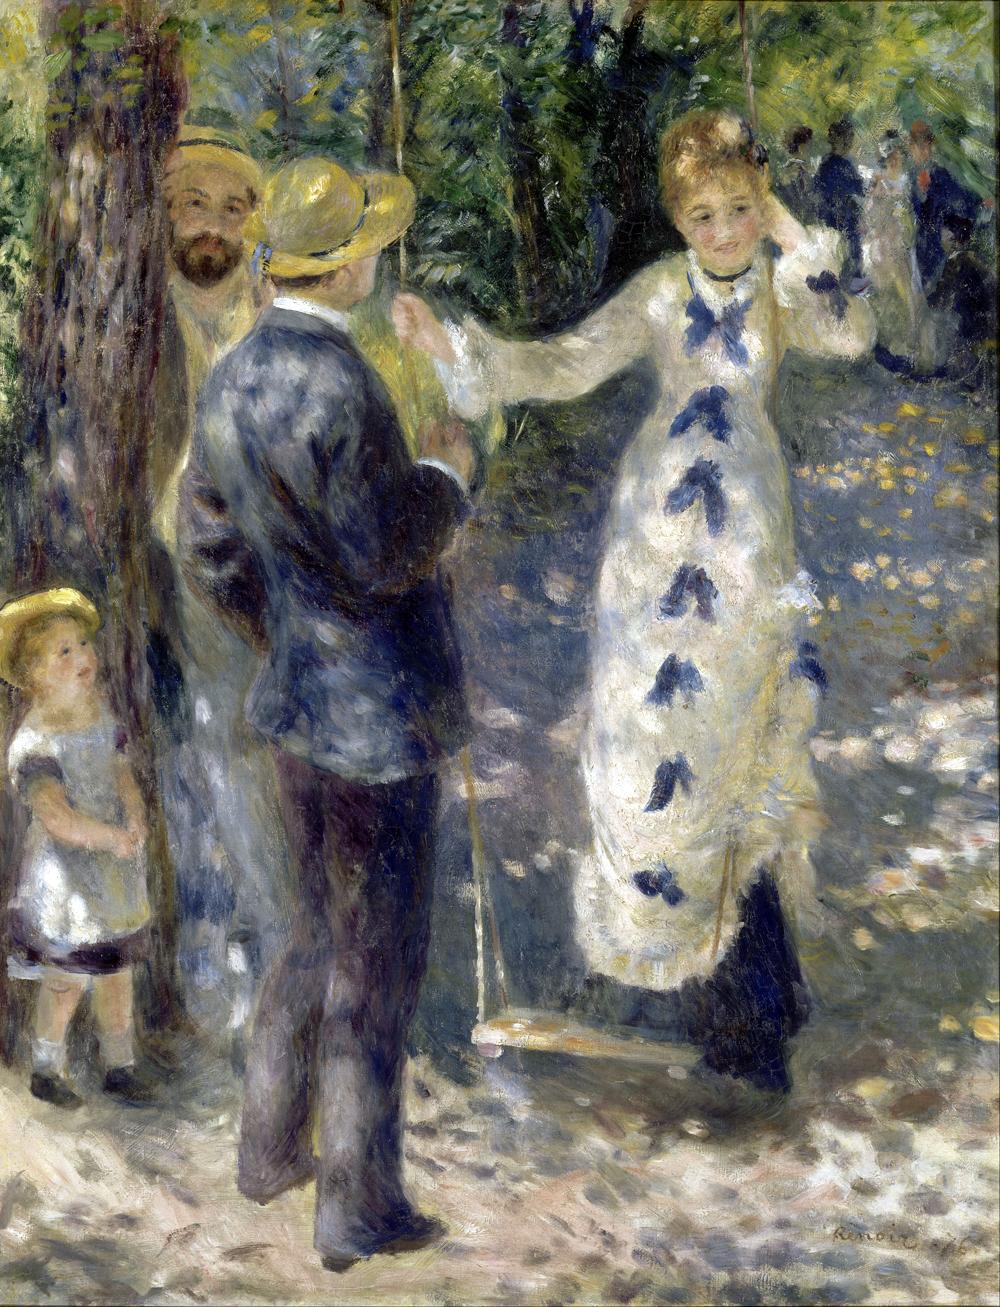 Pierre -Auguste Renoir, Huśtawka, 1876, MUZEUM d'ORSAY